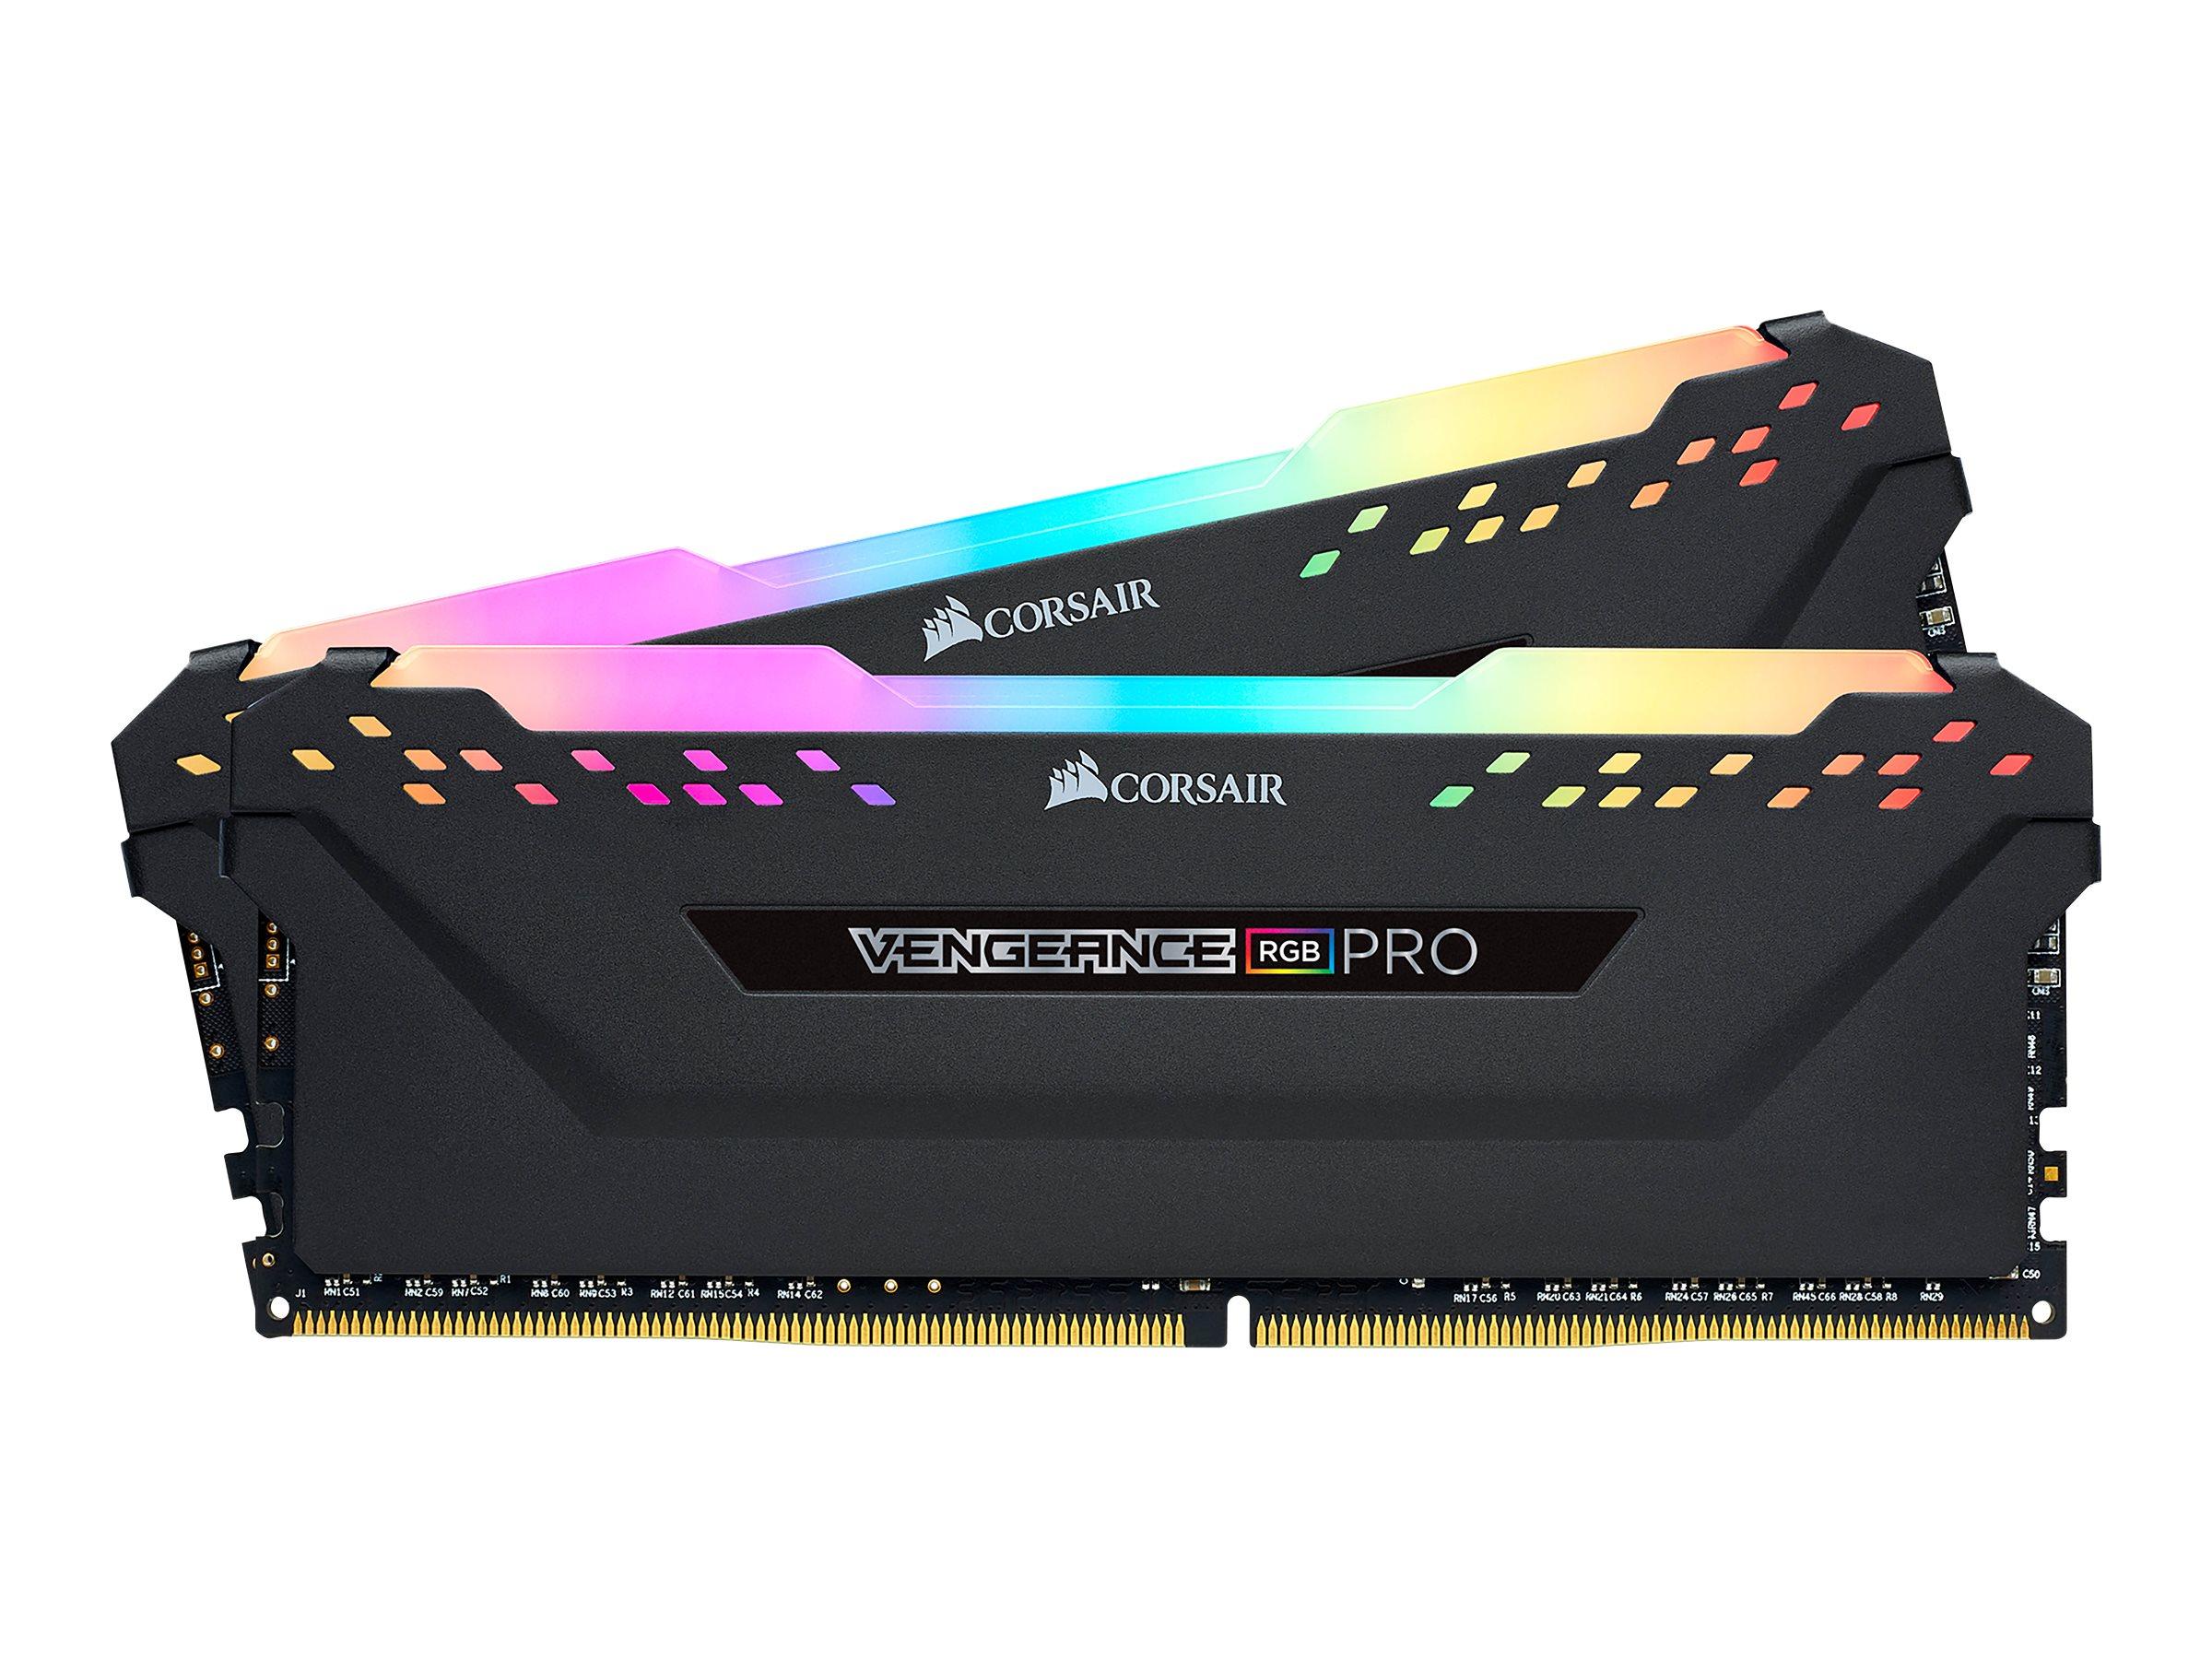 CORSAIR Vengeance RGB PRO - DDR4 - 32 GB: 2 x 16 GB - DIMM 288-PIN - 3200 MHz / PC4-25600 - CL16